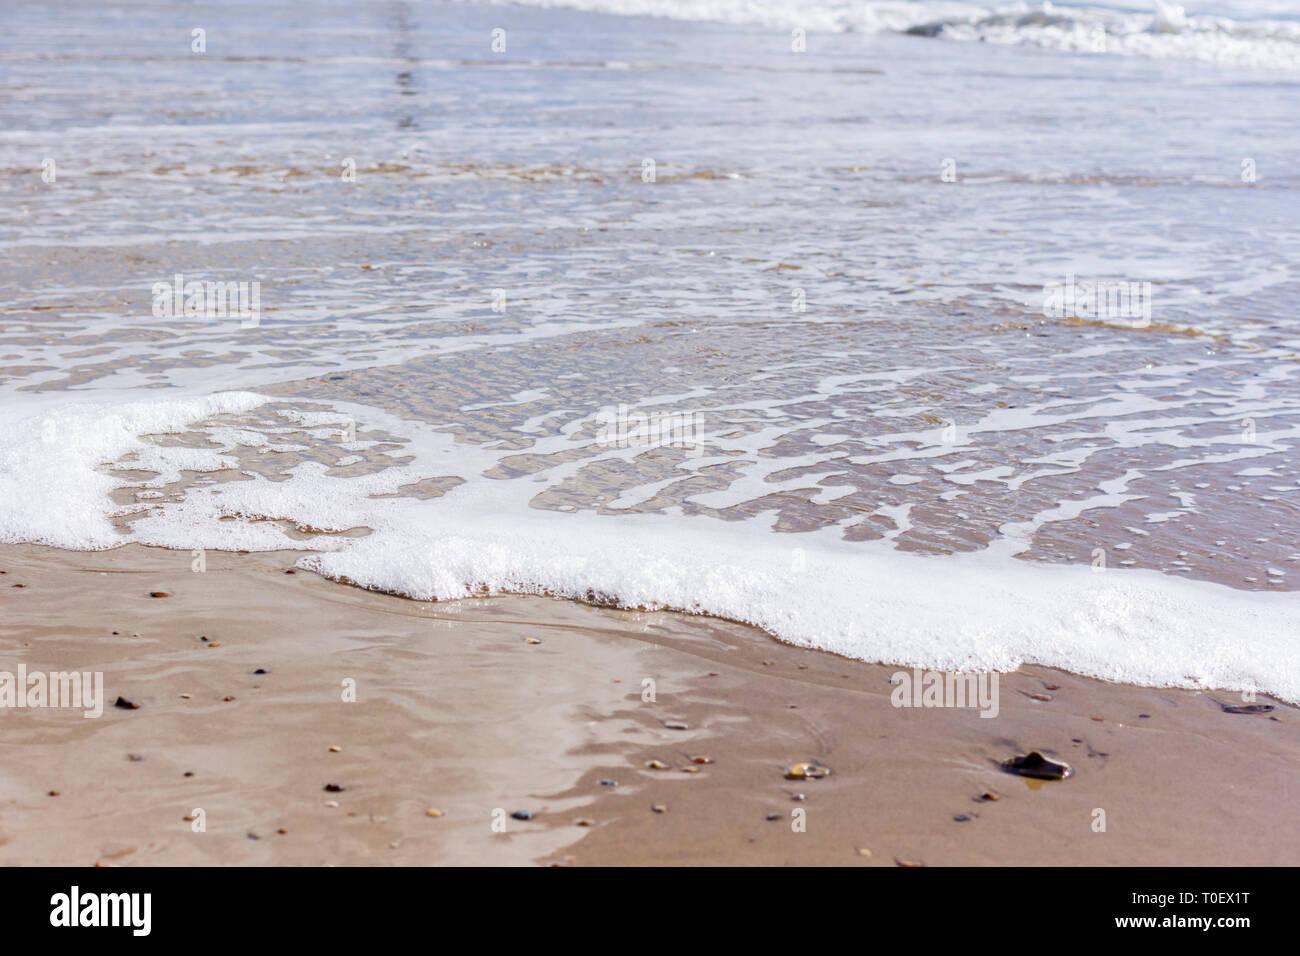 Waves lapping onto the beach, Bournemouth, Dorset, UK - Stock Image